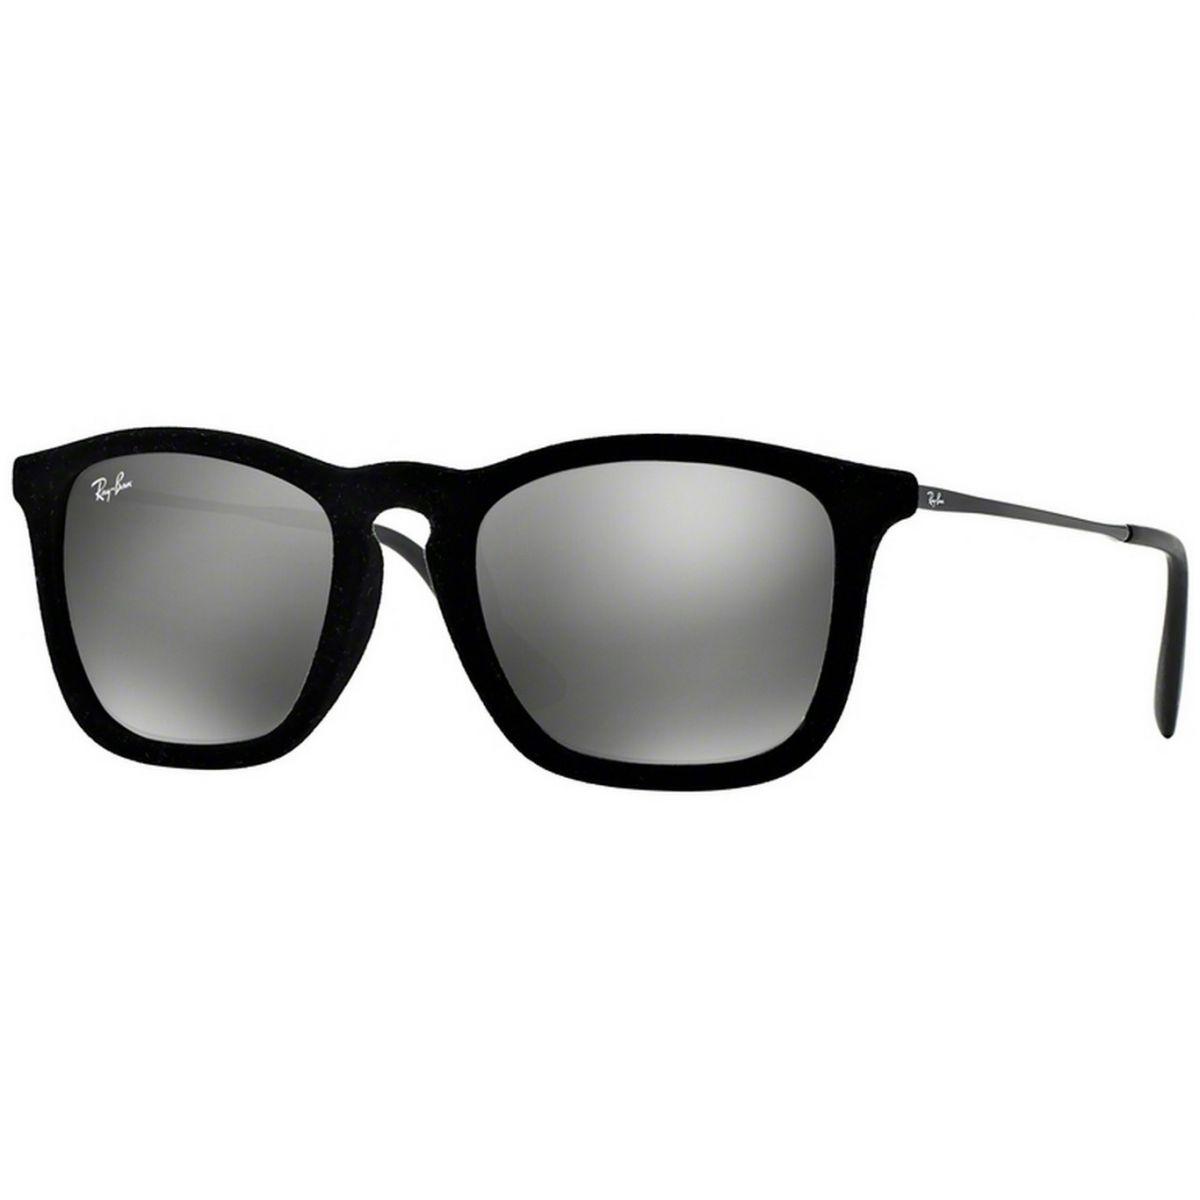 novo ray ban quadrado; oculos ray ban 6182